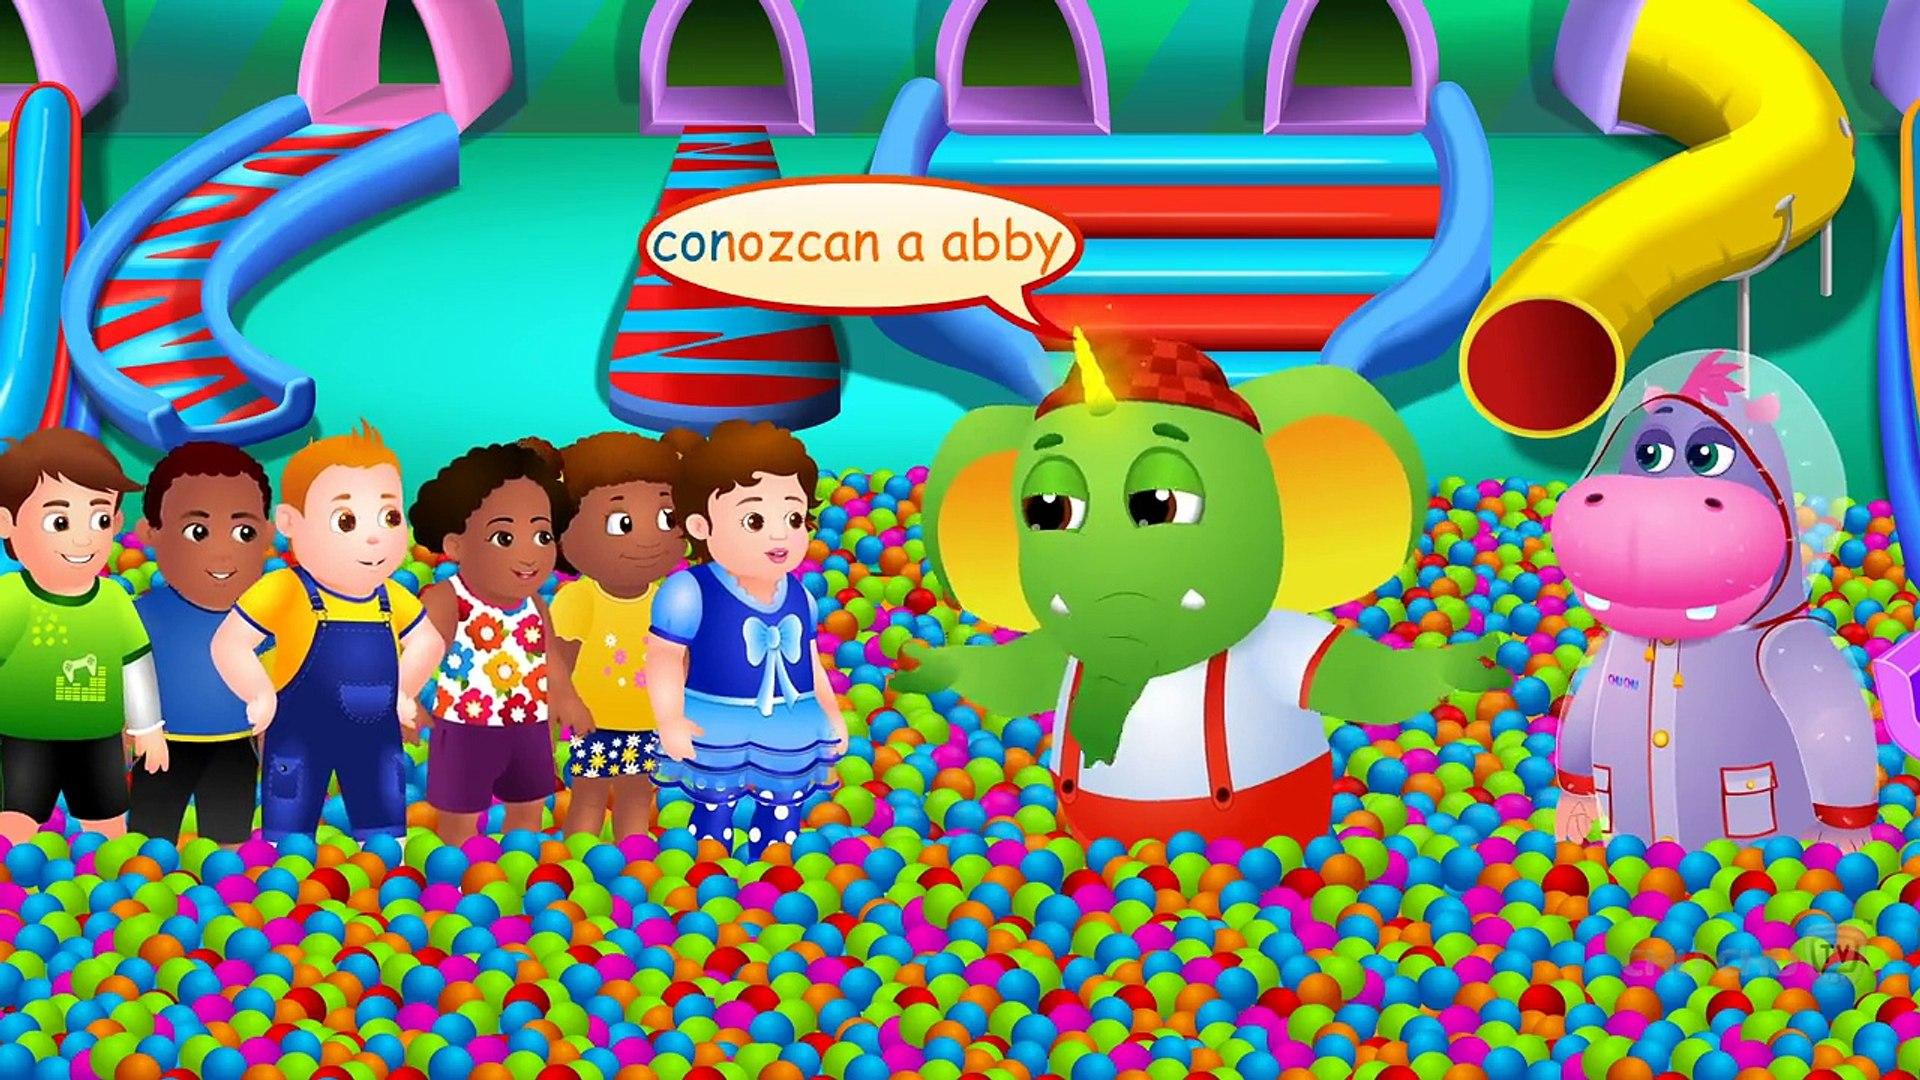 Huevos De La Chuchu Sorpresa Tv PelotasDiversión Mágicos Show Piscina Sorpresas pSzMVqU